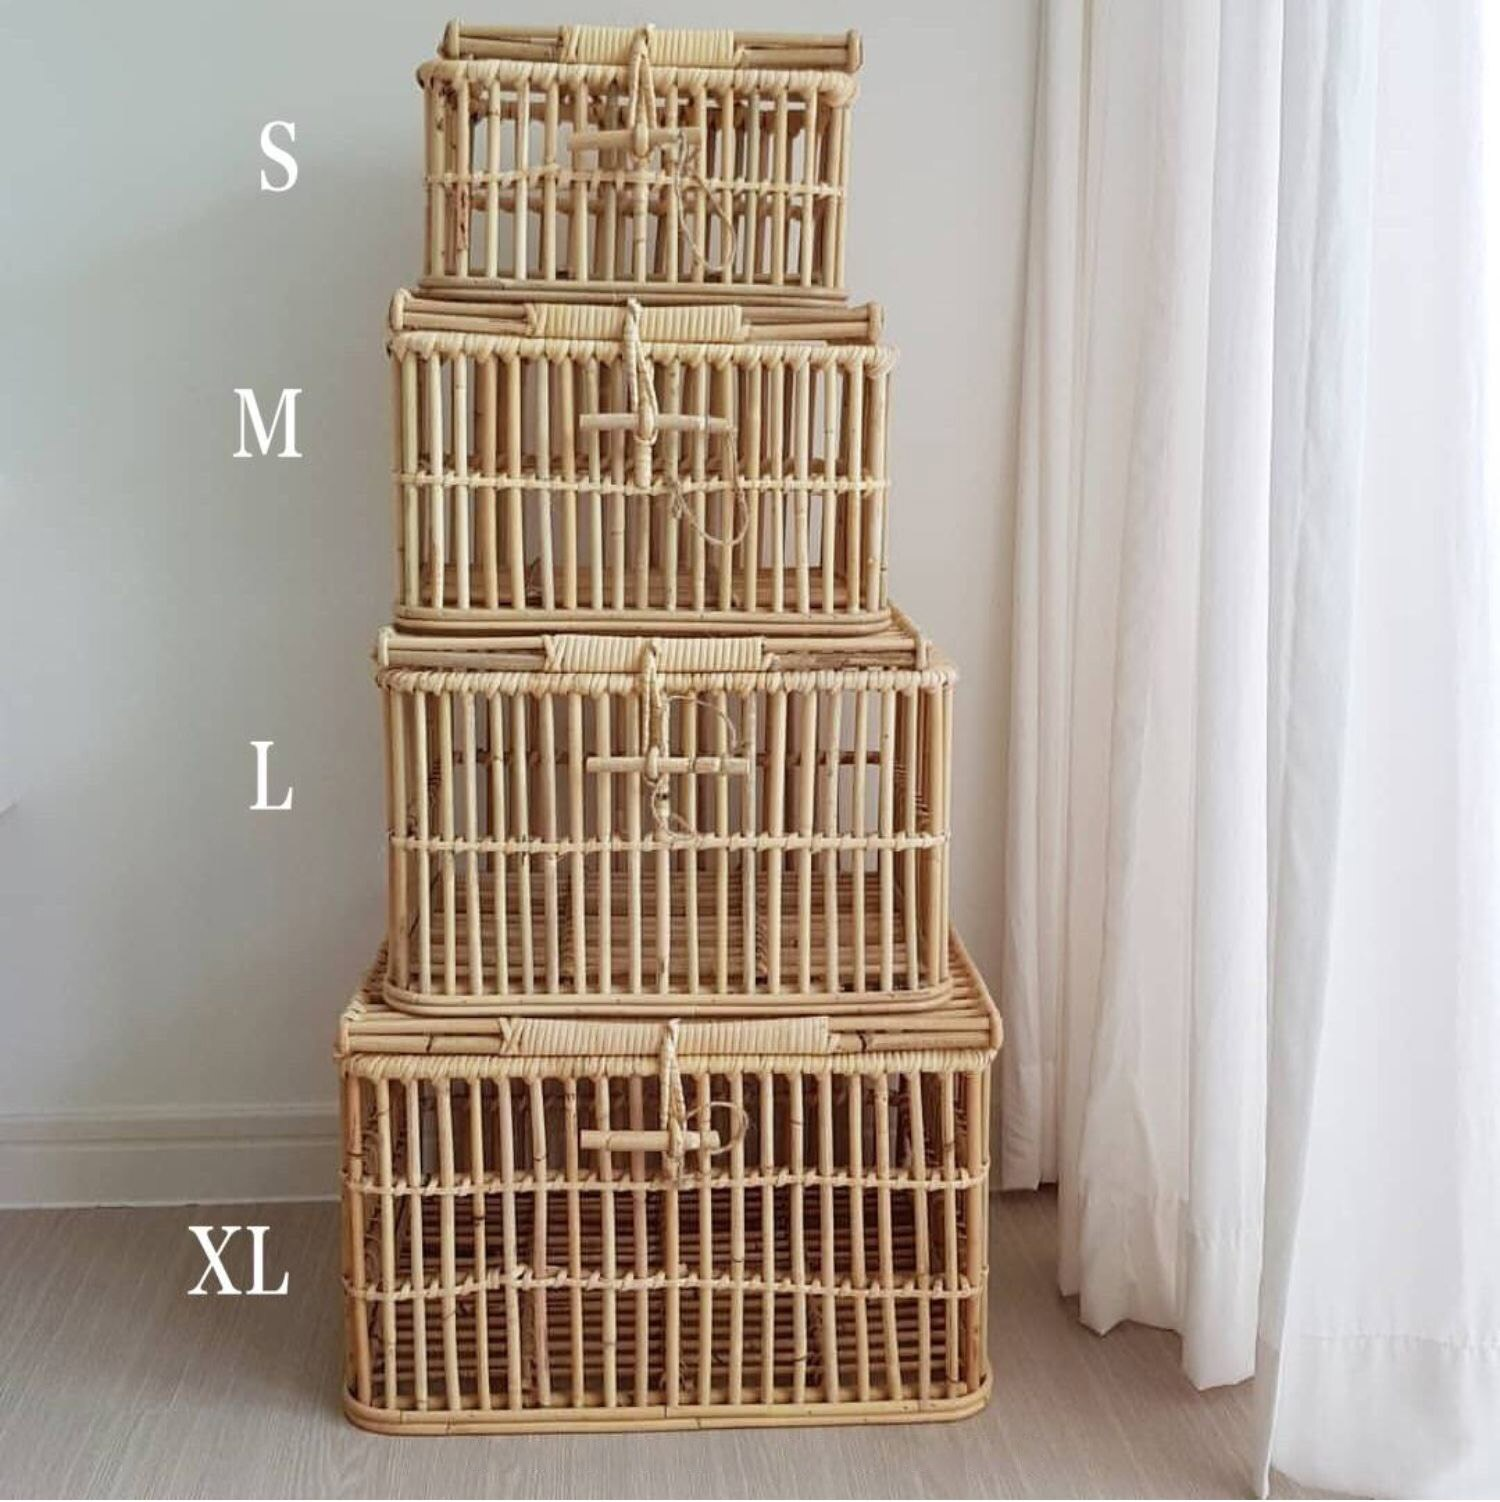 Shelf baskets Hand-woven rectangular rattan storage basket with lid, debris storage box